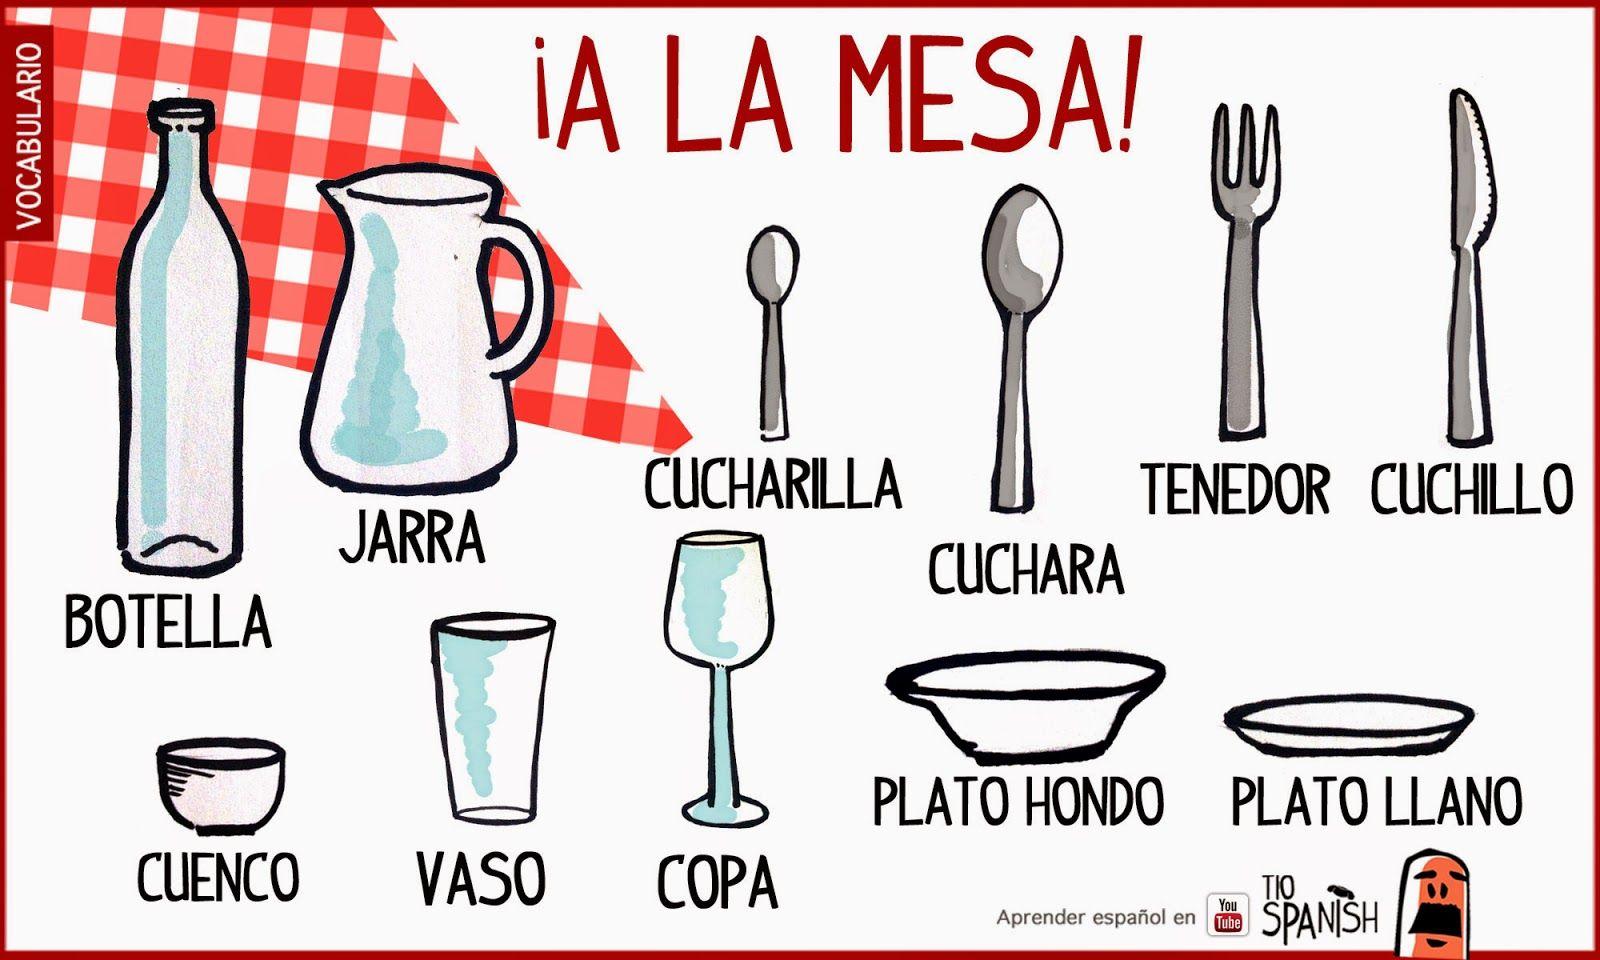 Spanish Vocabulary For Kitchen Utensils Spanish Words Vocabulario De La Mesa